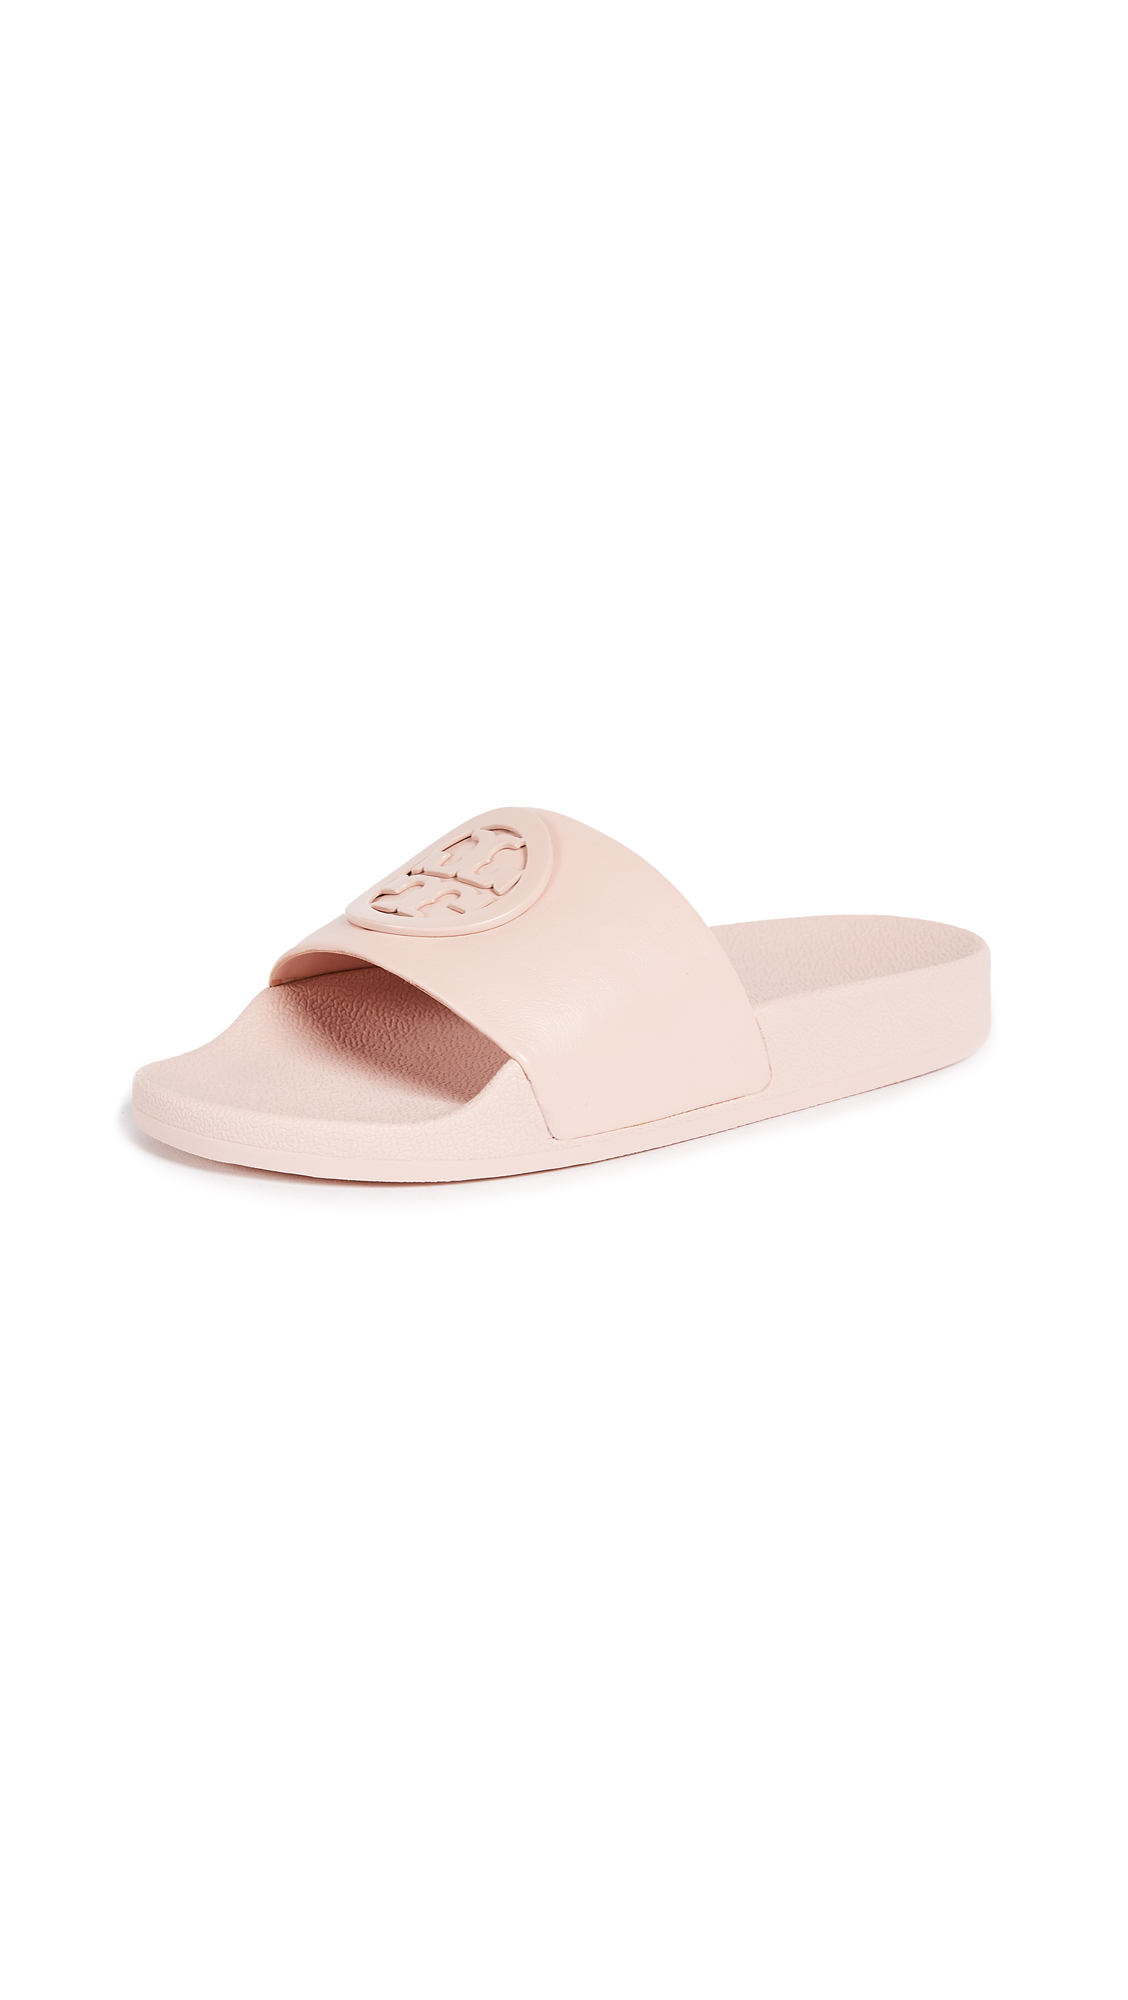 Tory Burch Lina Slides - Shell Pink